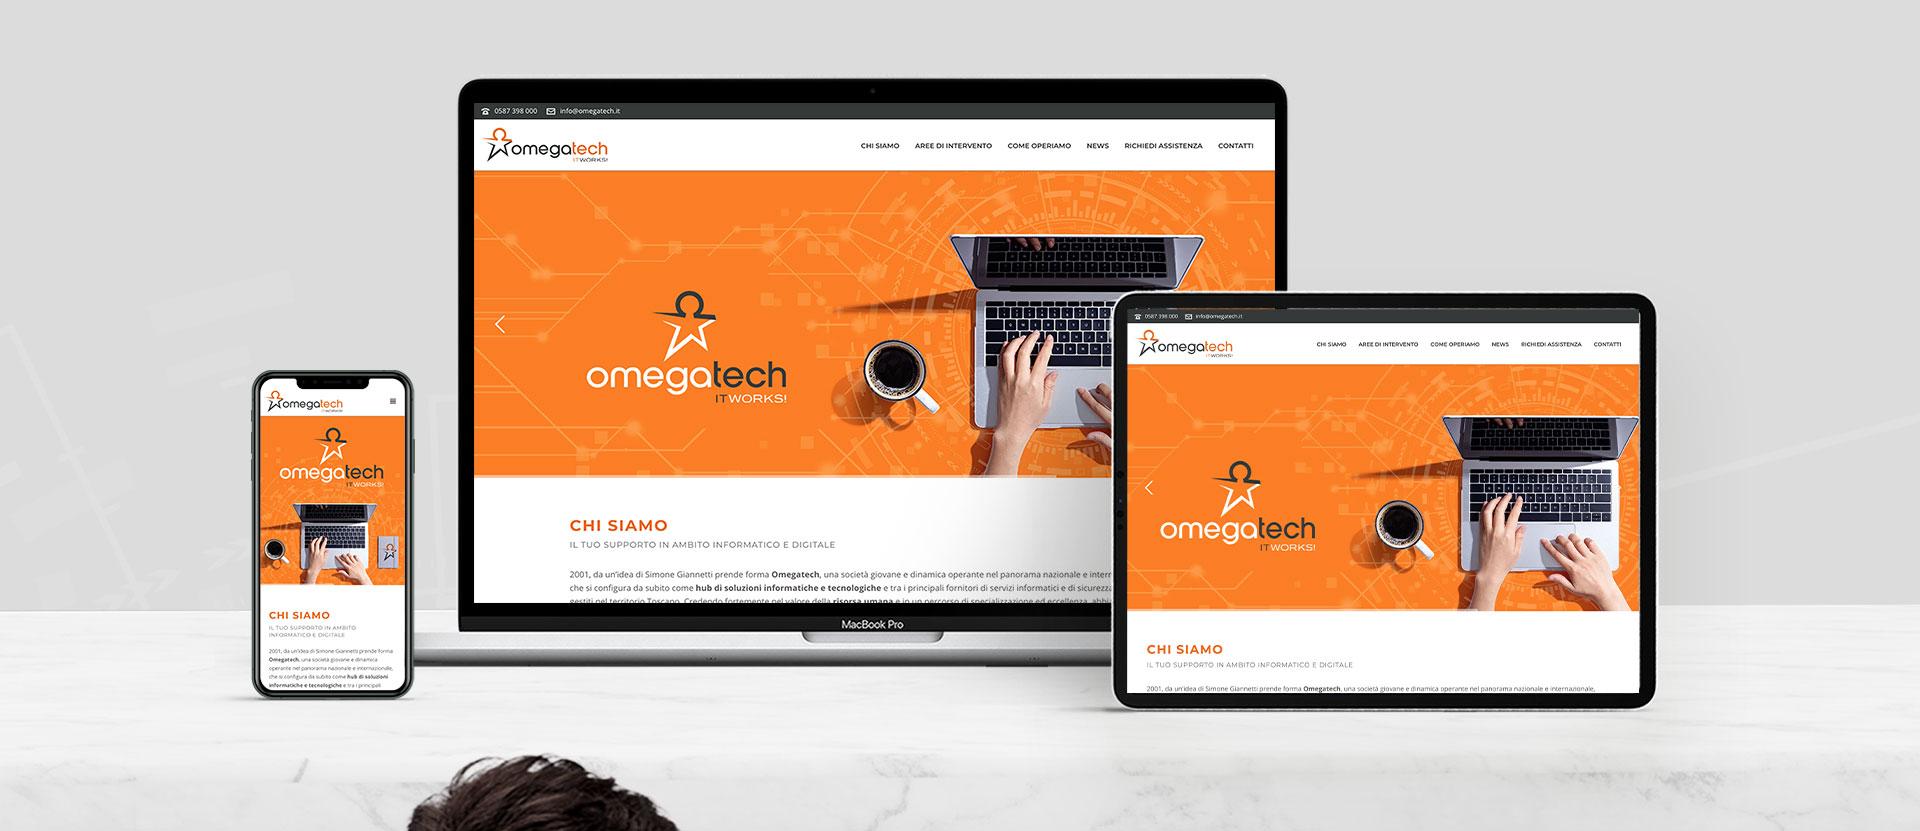 omegatech-zerouno-design–website